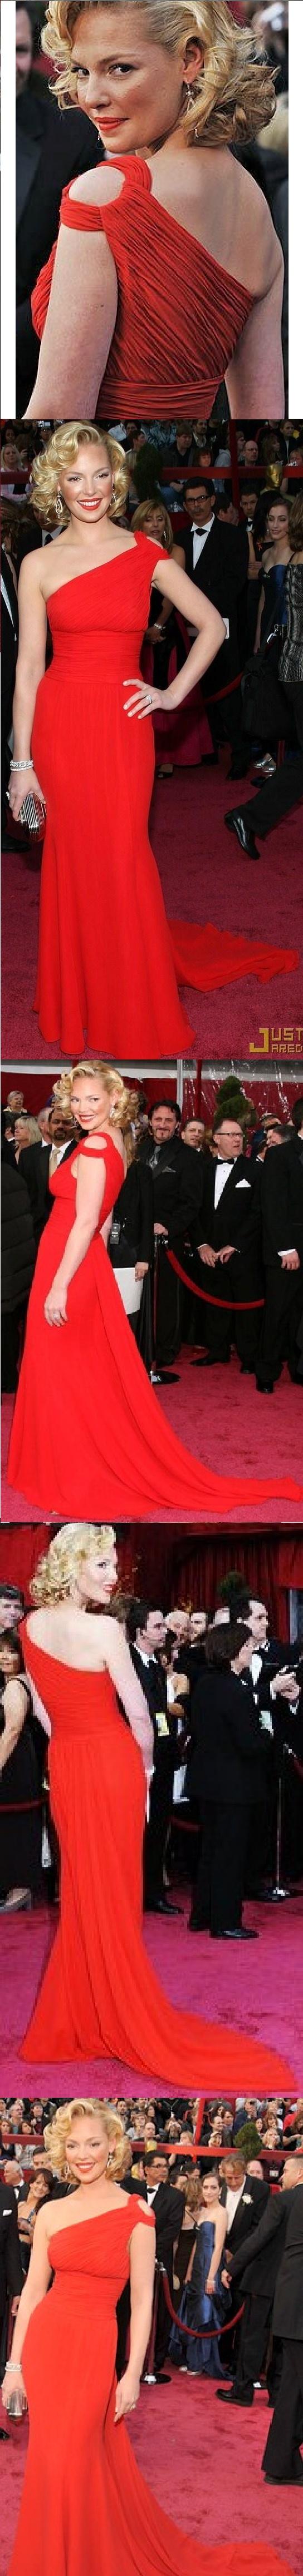 Vestido Vermelho - oscar 2008